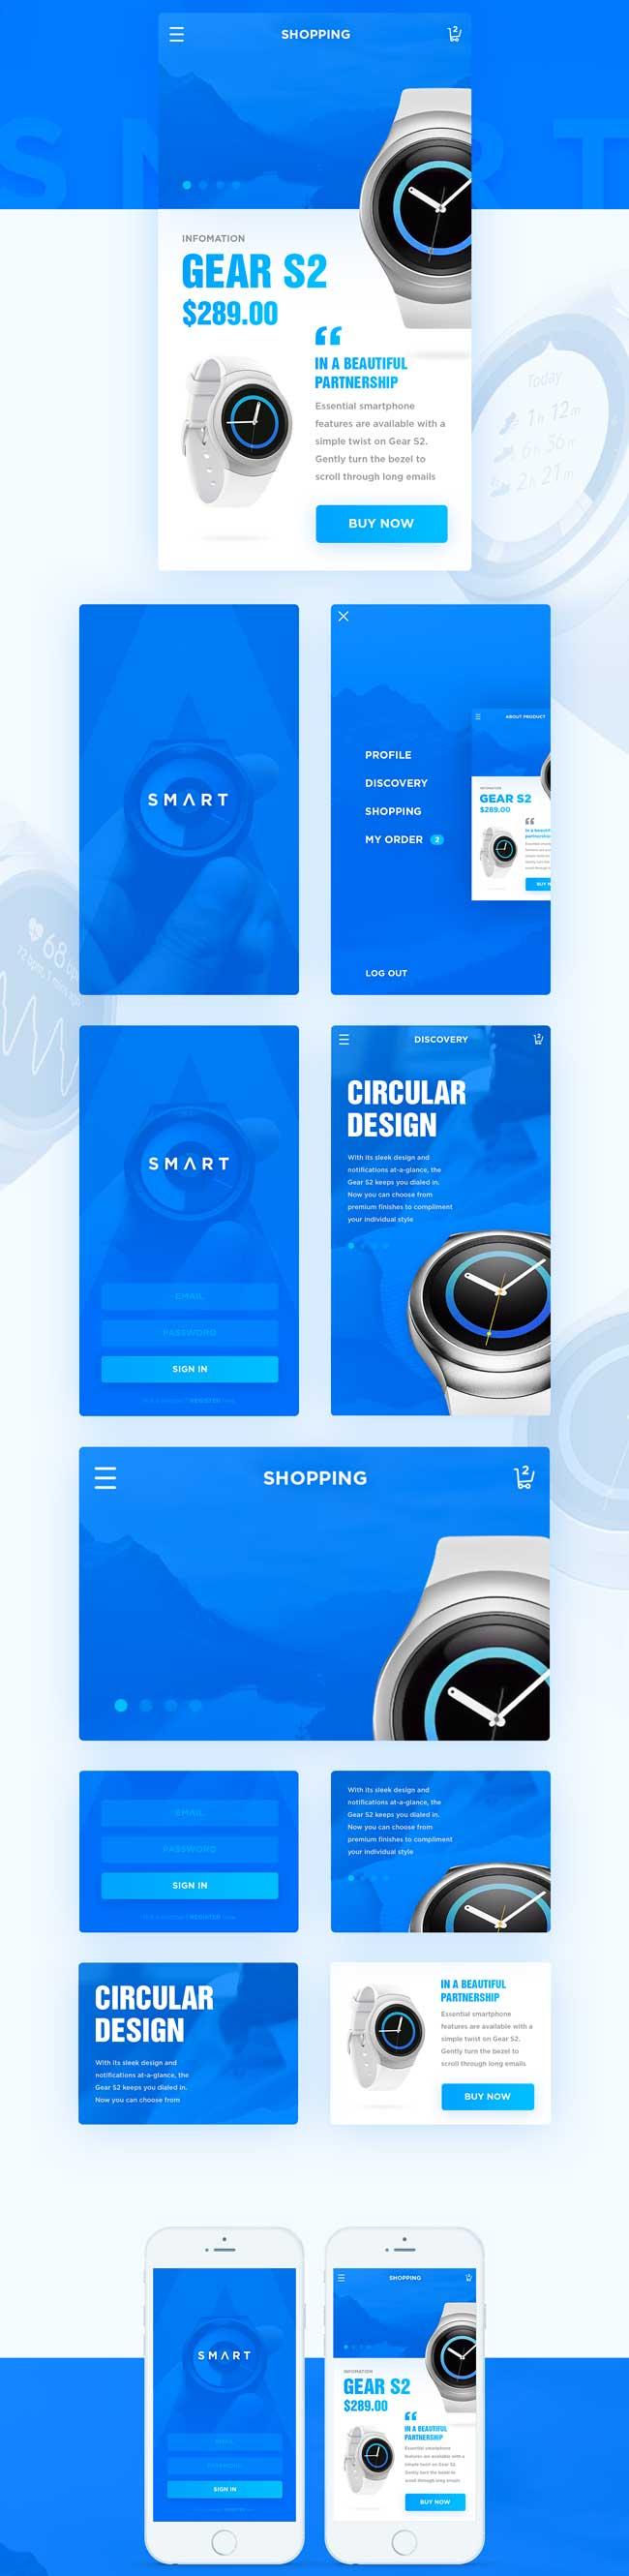 Free Smartwatch App UI PSD